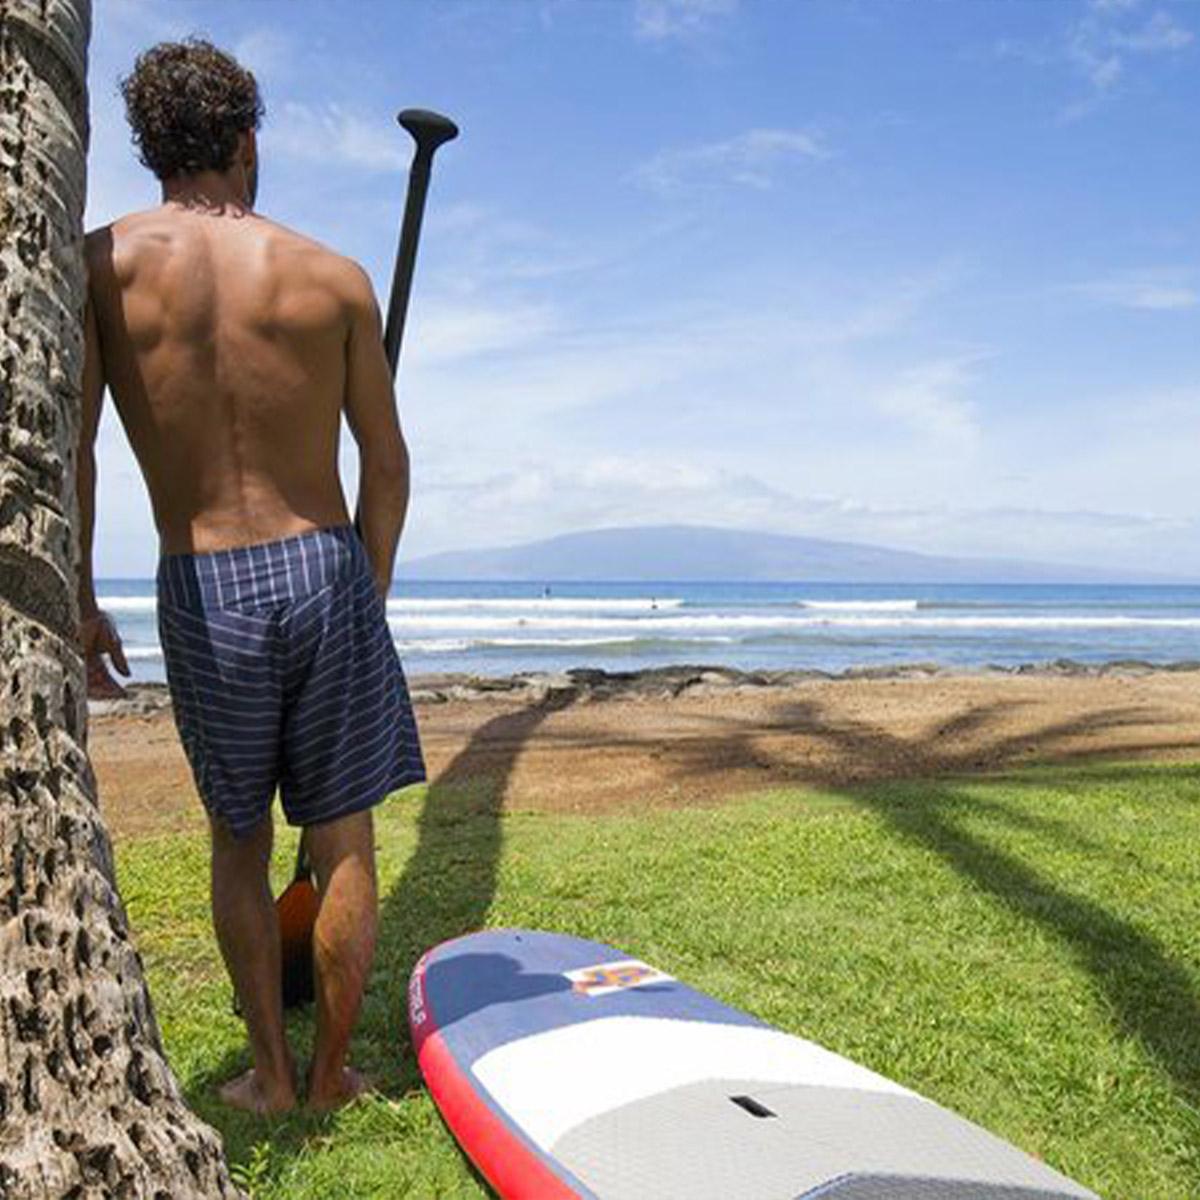 jp-surf-wood-edition-sup-board-2019-actionshot-3